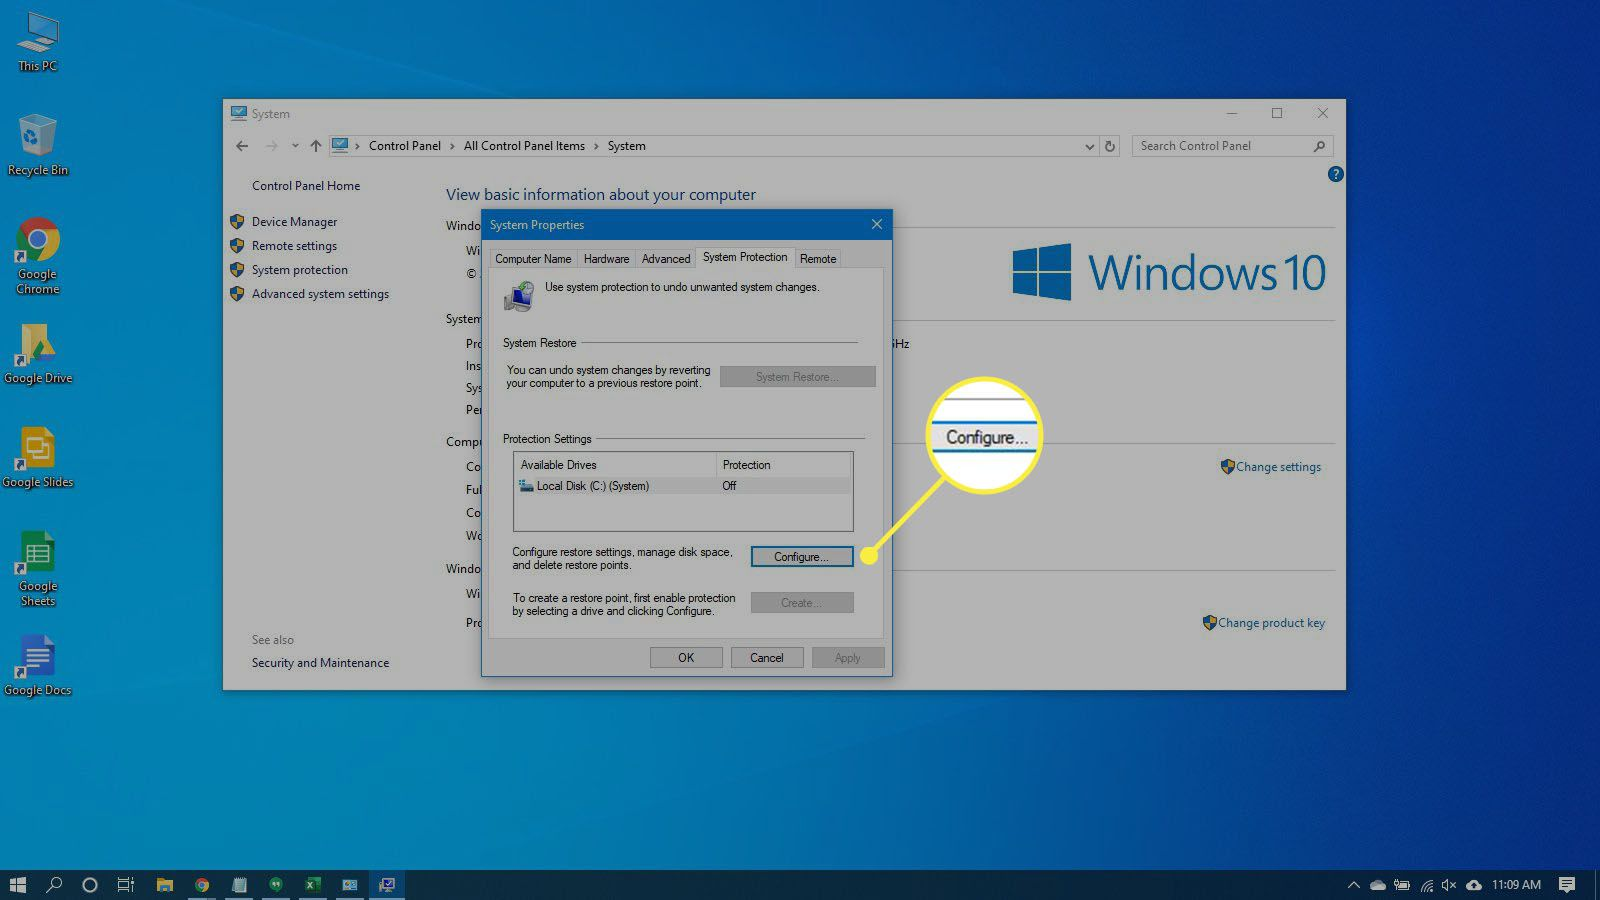 System properties in Windows 10.